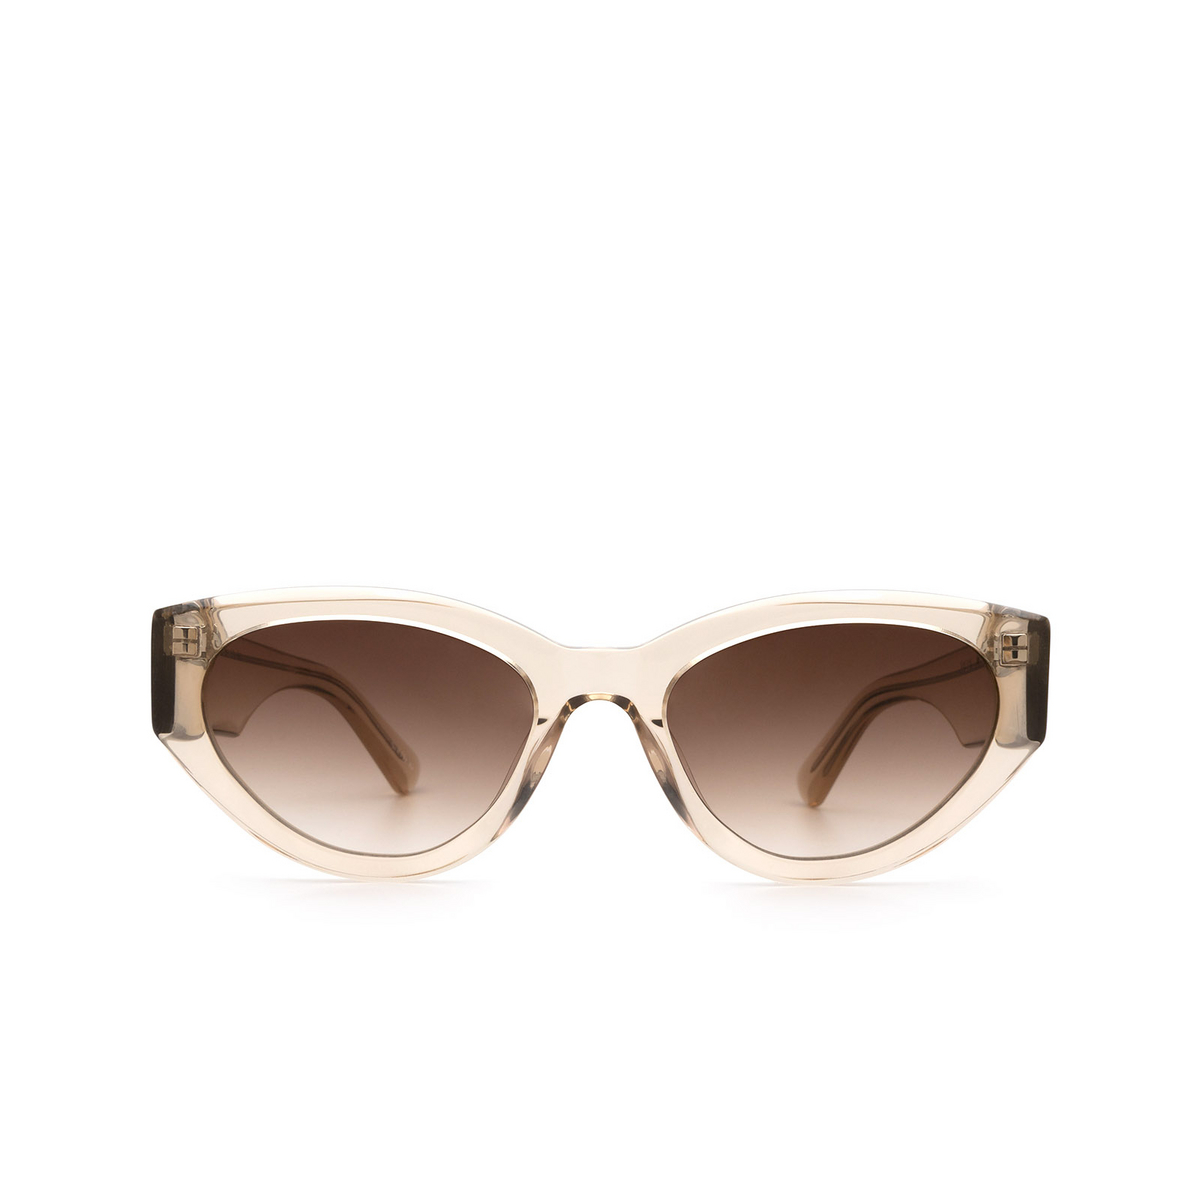 Chimi® Cat-eye Sunglasses: 06 color Ecru - front view.